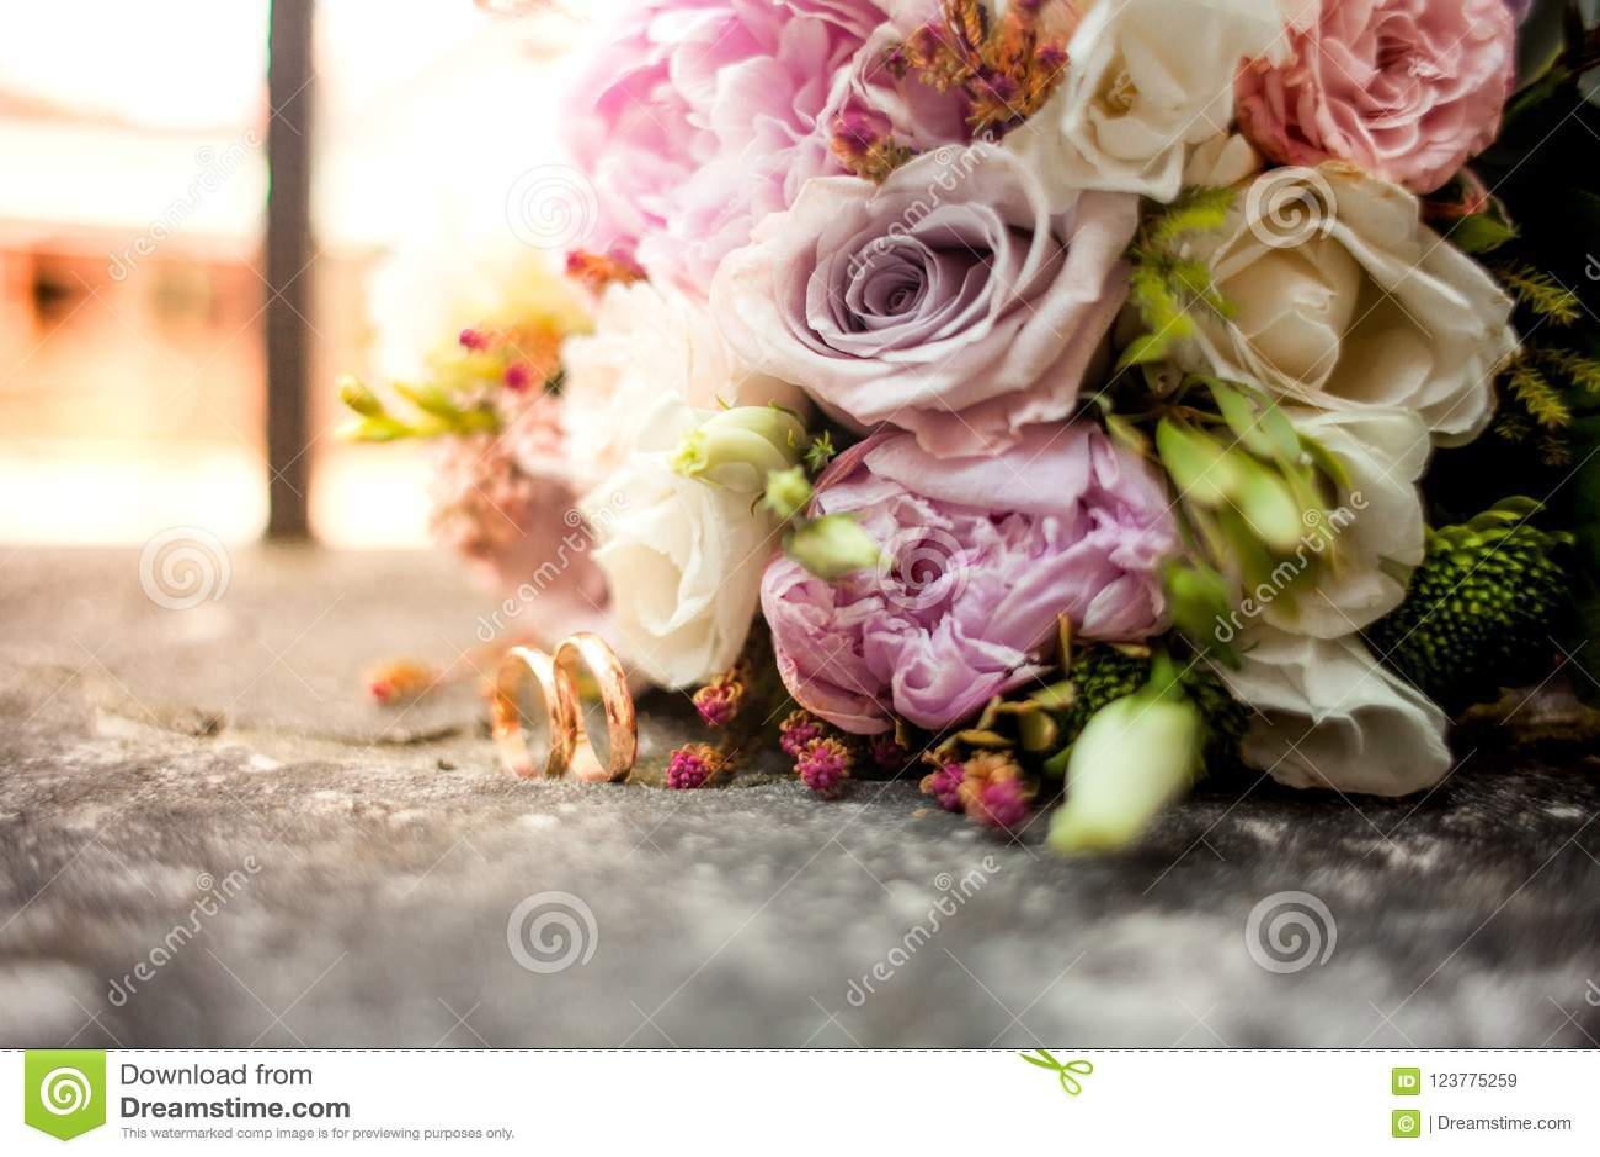 Stylish Wedding Bouquet Flowers From Bush Roses, Eustoma And Gold ...